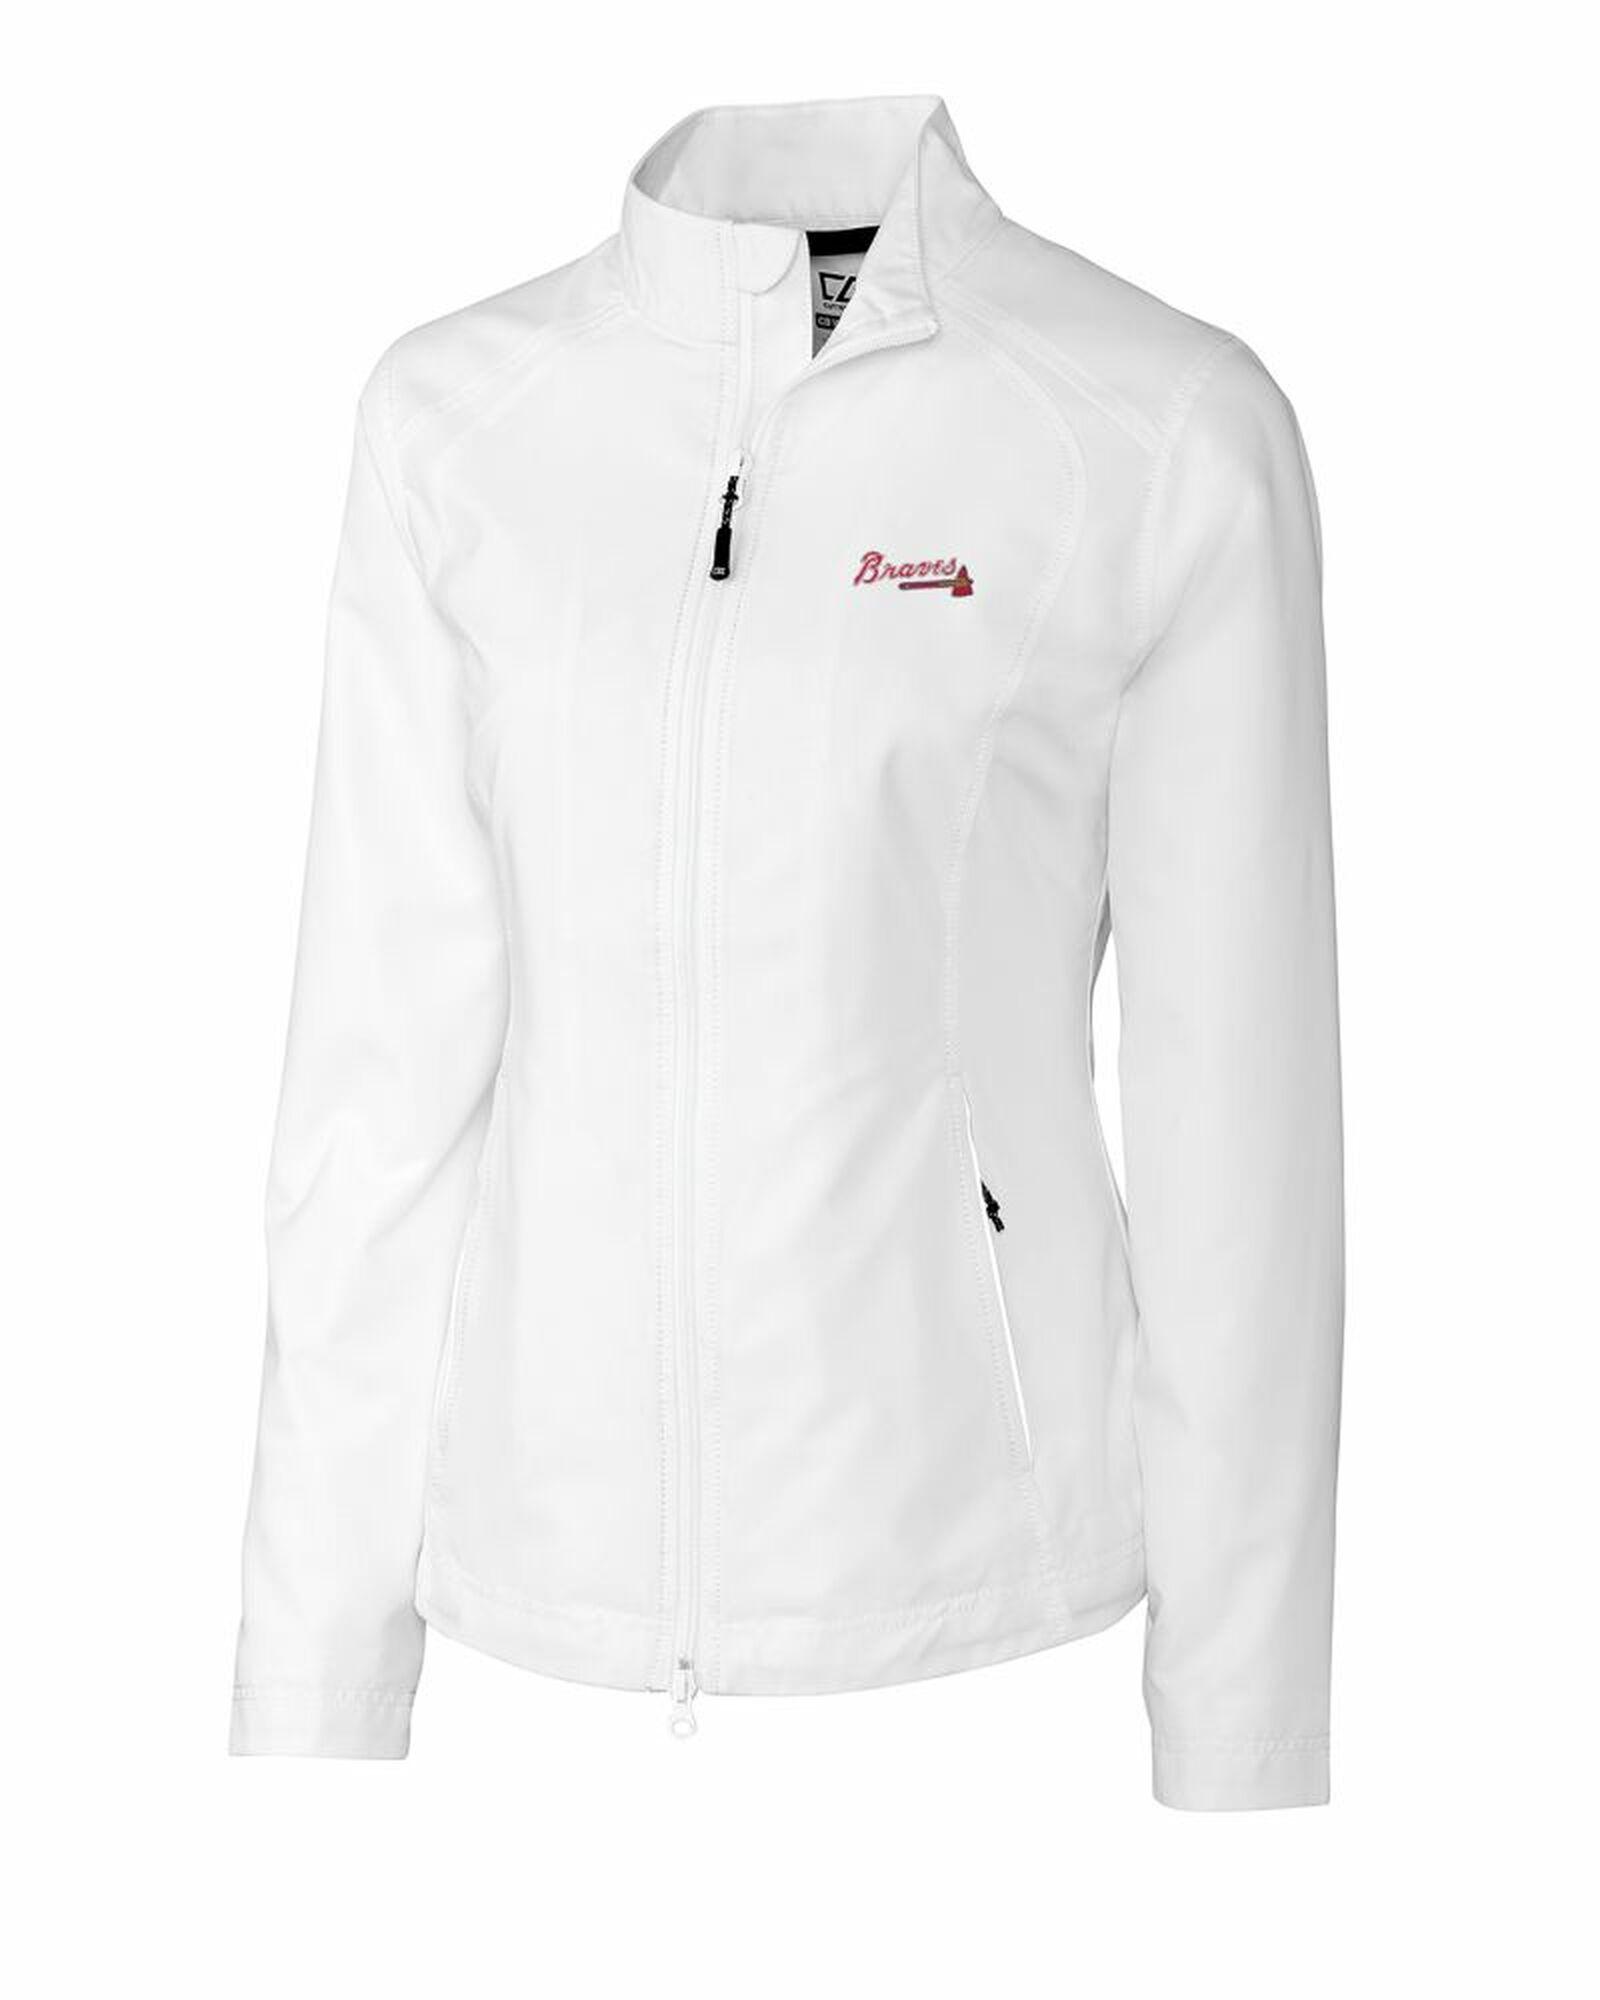 Cutter and Buck Ladies Atlanta Braves WeatherTec Beacon Full-Zip Jacket